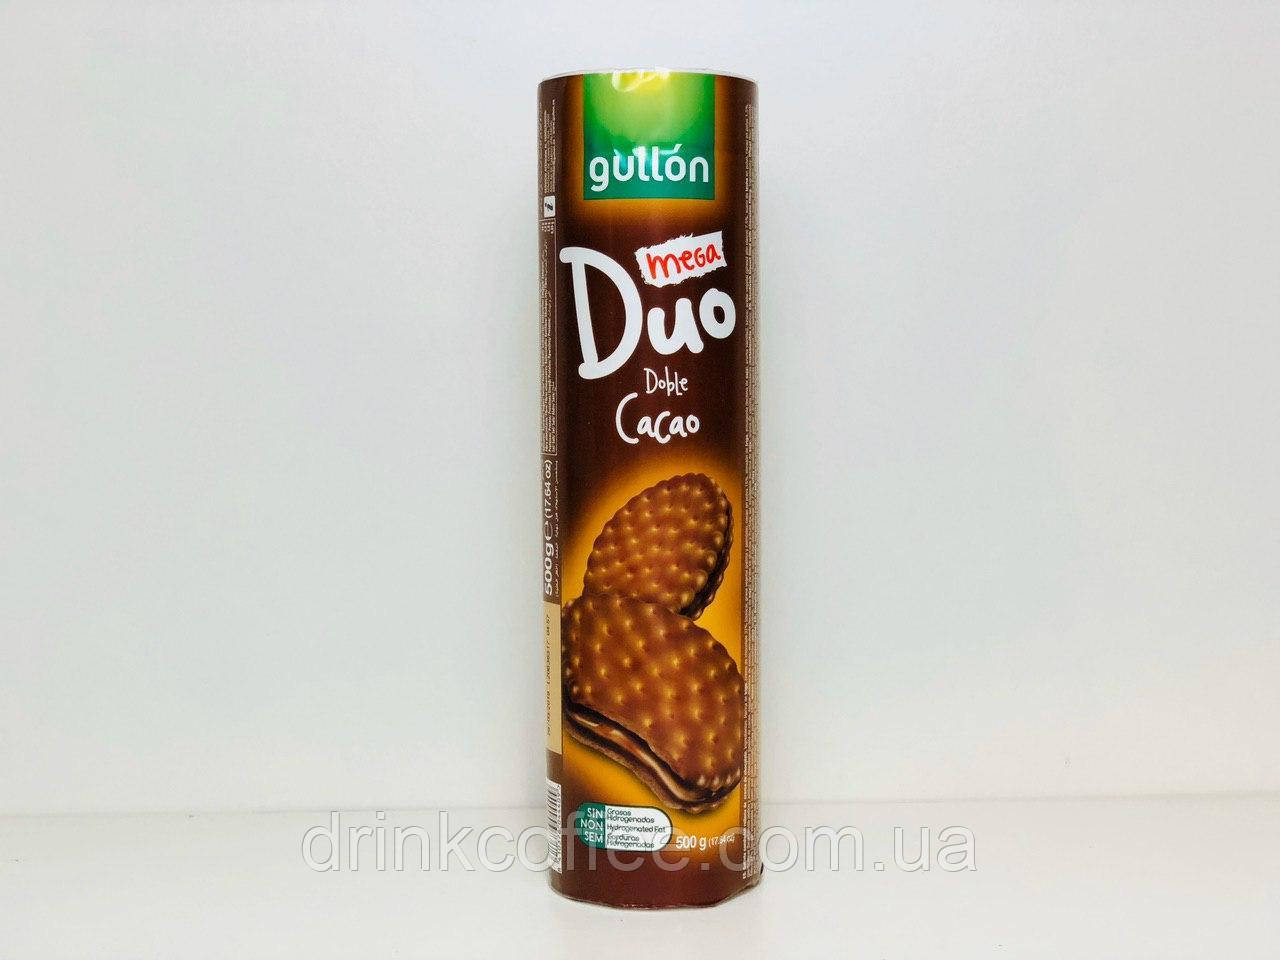 Печенье сэндвич Gullon Duo Double Cacao Испания 500г